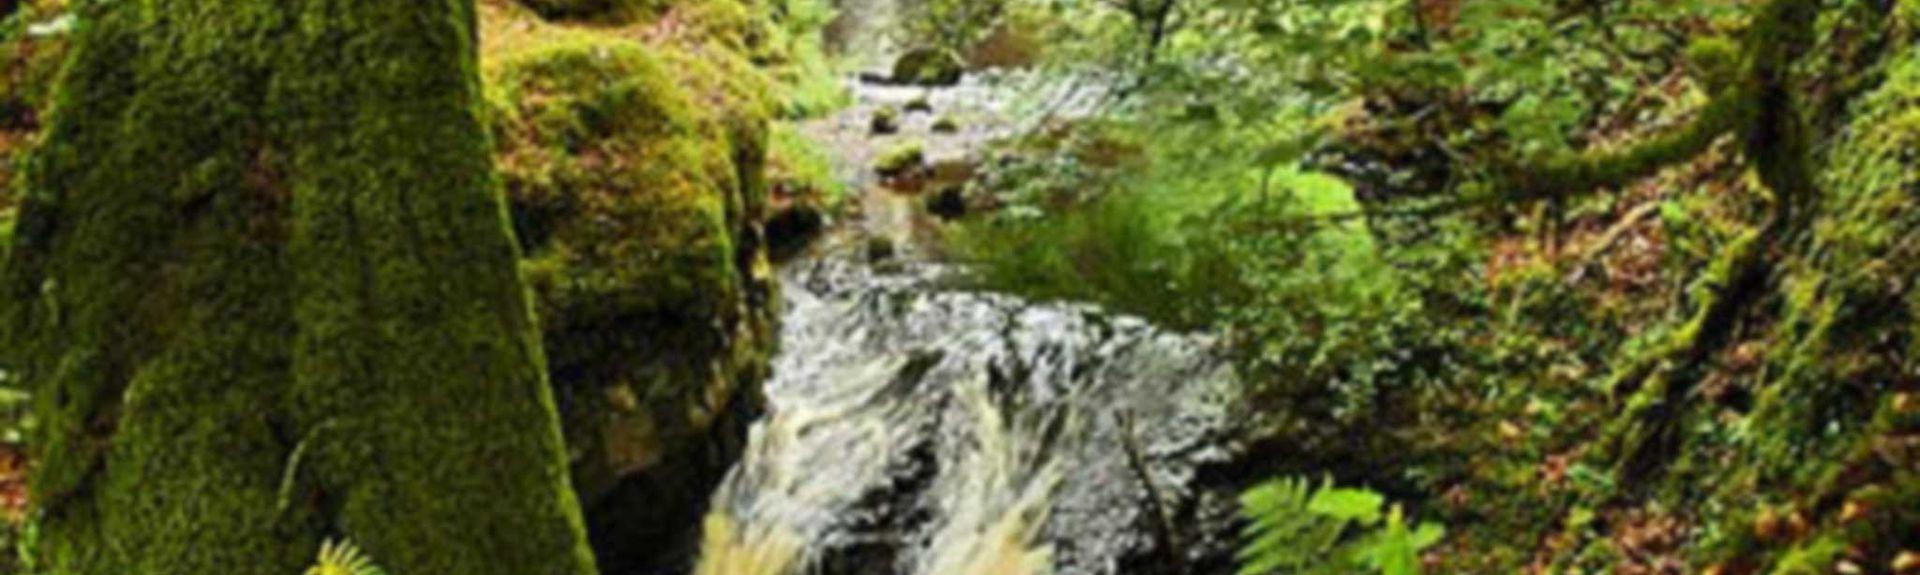 Galloway Forest Park, Castle Douglas, Scotland, United Kingdom